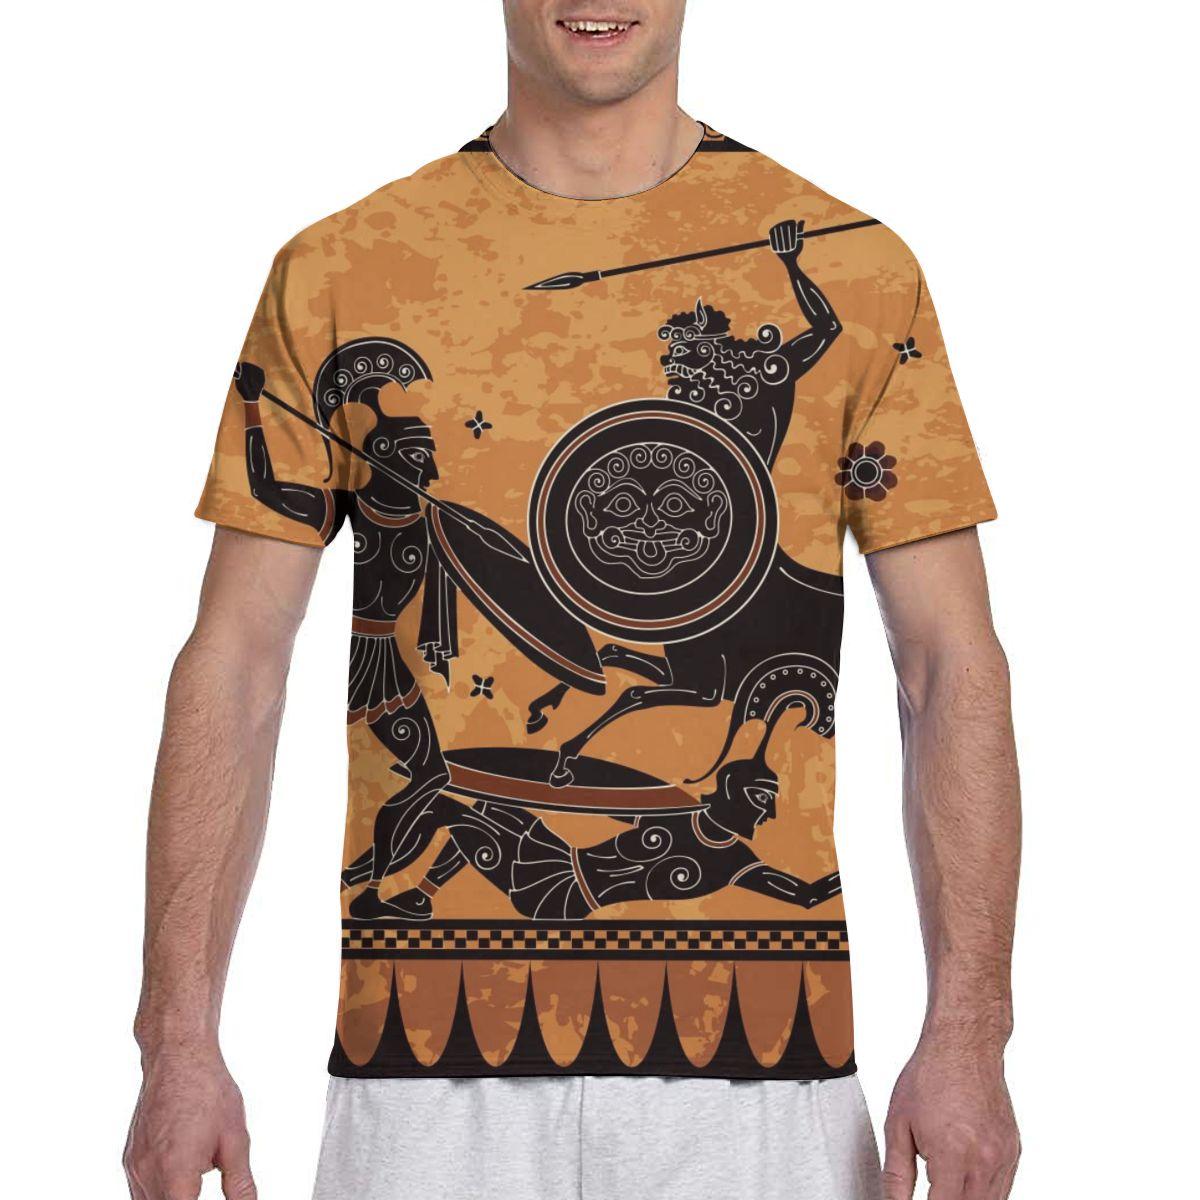 Camiseta a la moda de Guerrero griego antiguo para hombre, camiseta de verano 2020 con cuello redondo para hombre